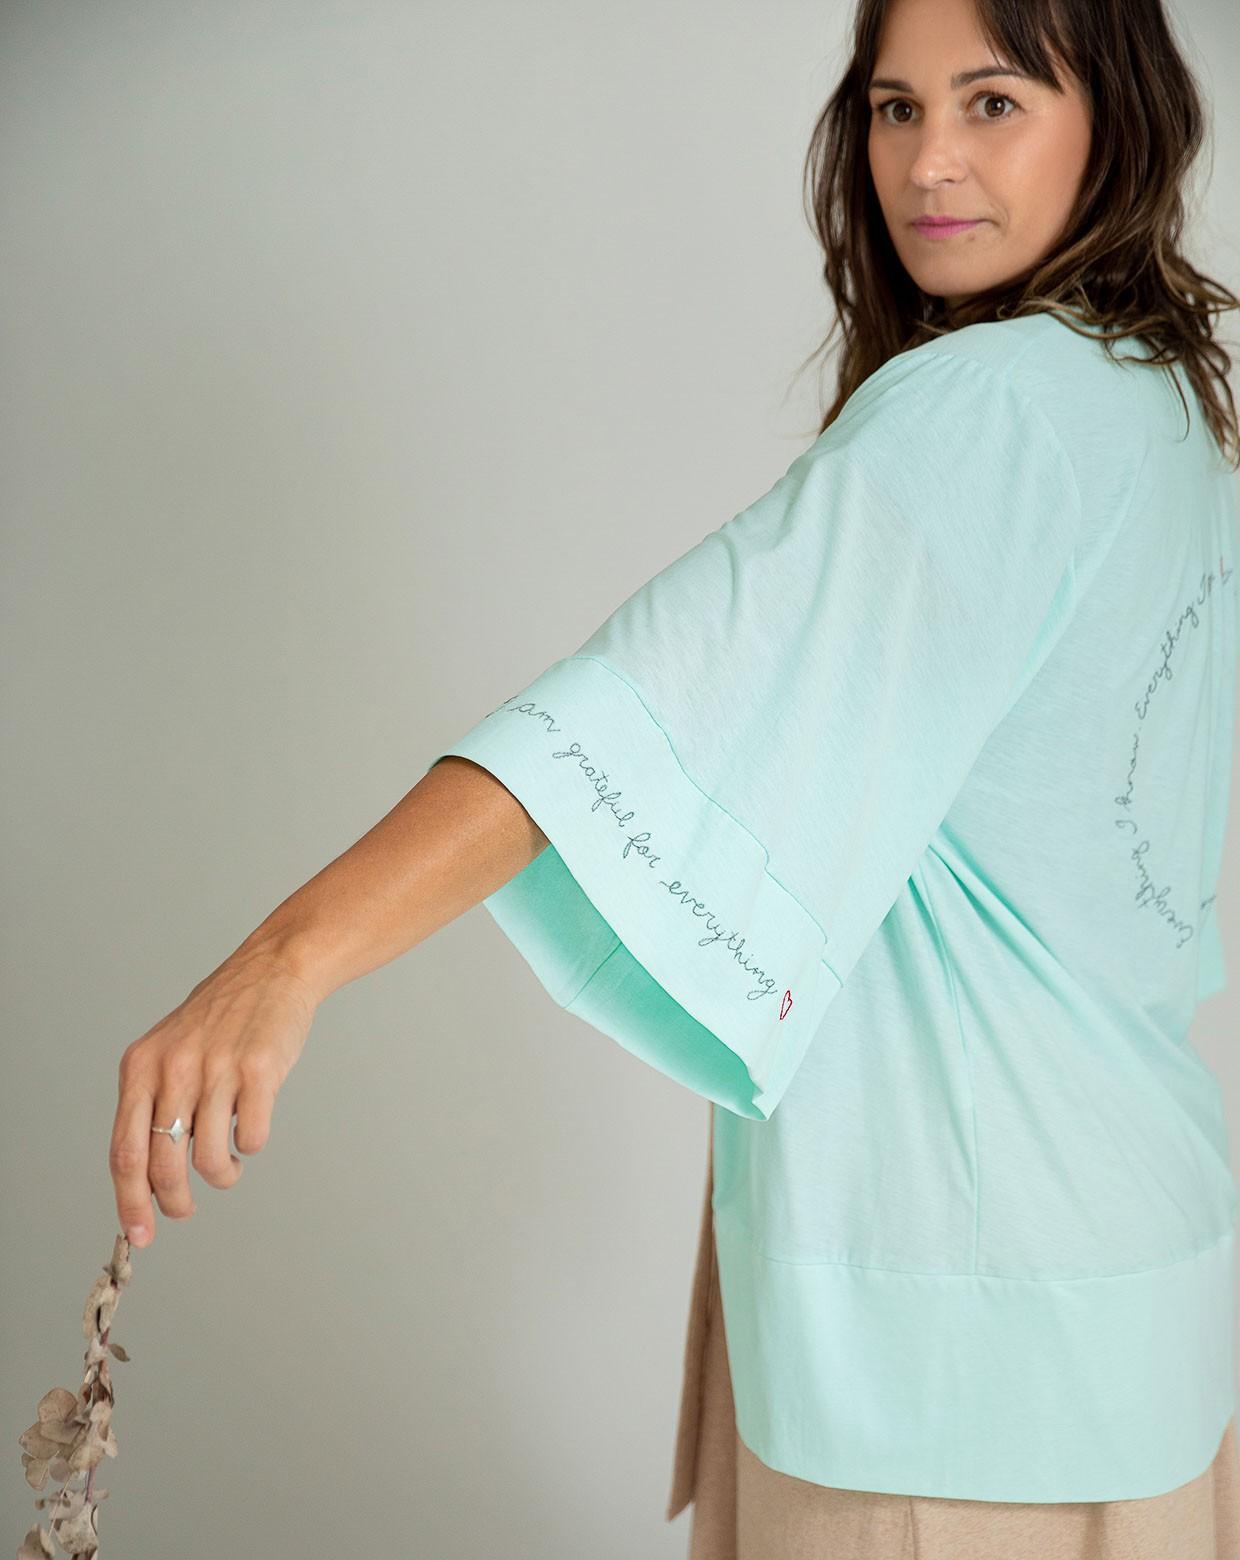 Kimono Grateful - Algodão Orgânico Pima